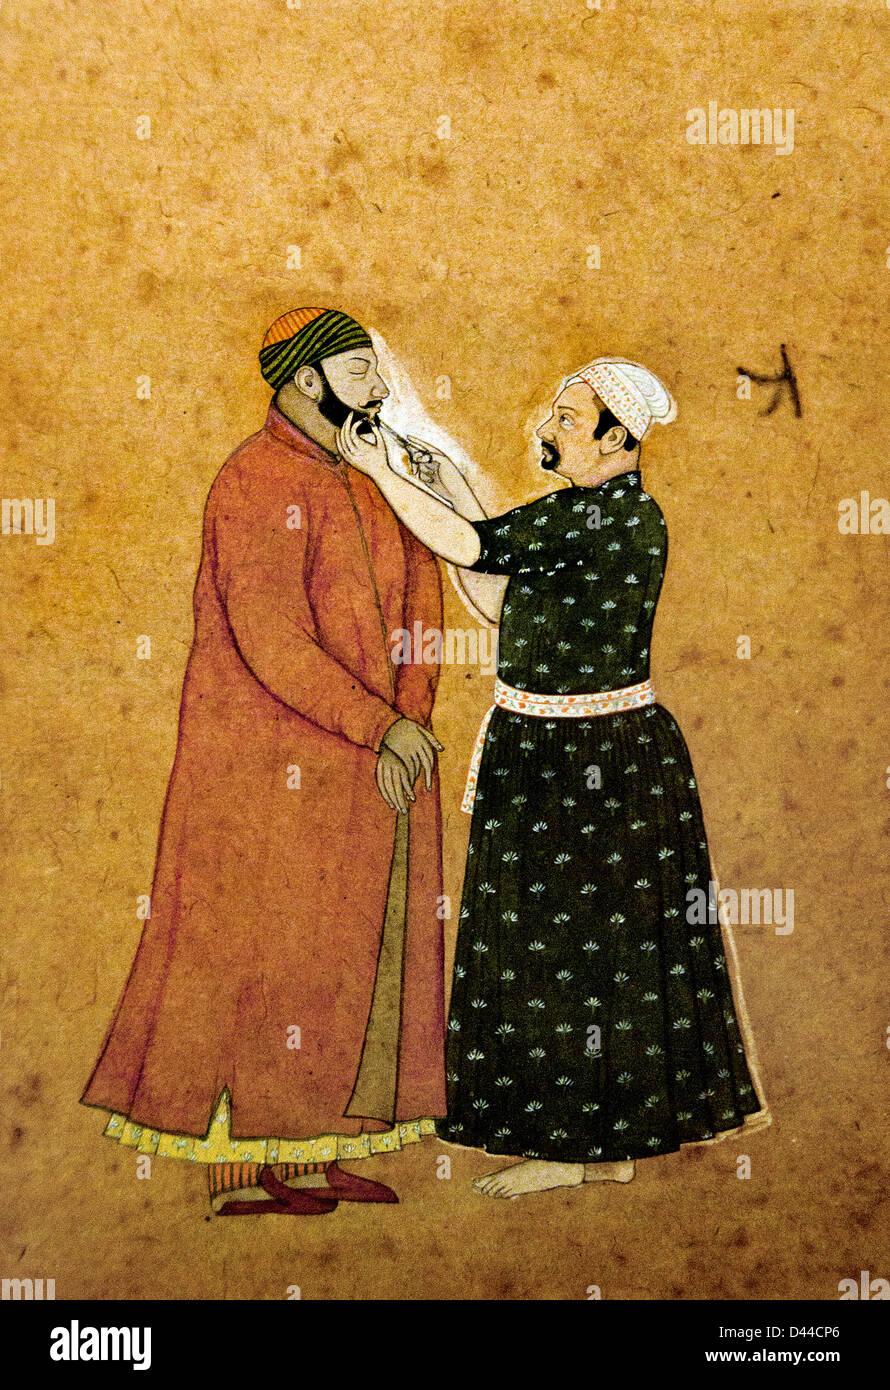 Balwath Singh getting his beard trimmed 1755 Pahari India - Stock Image